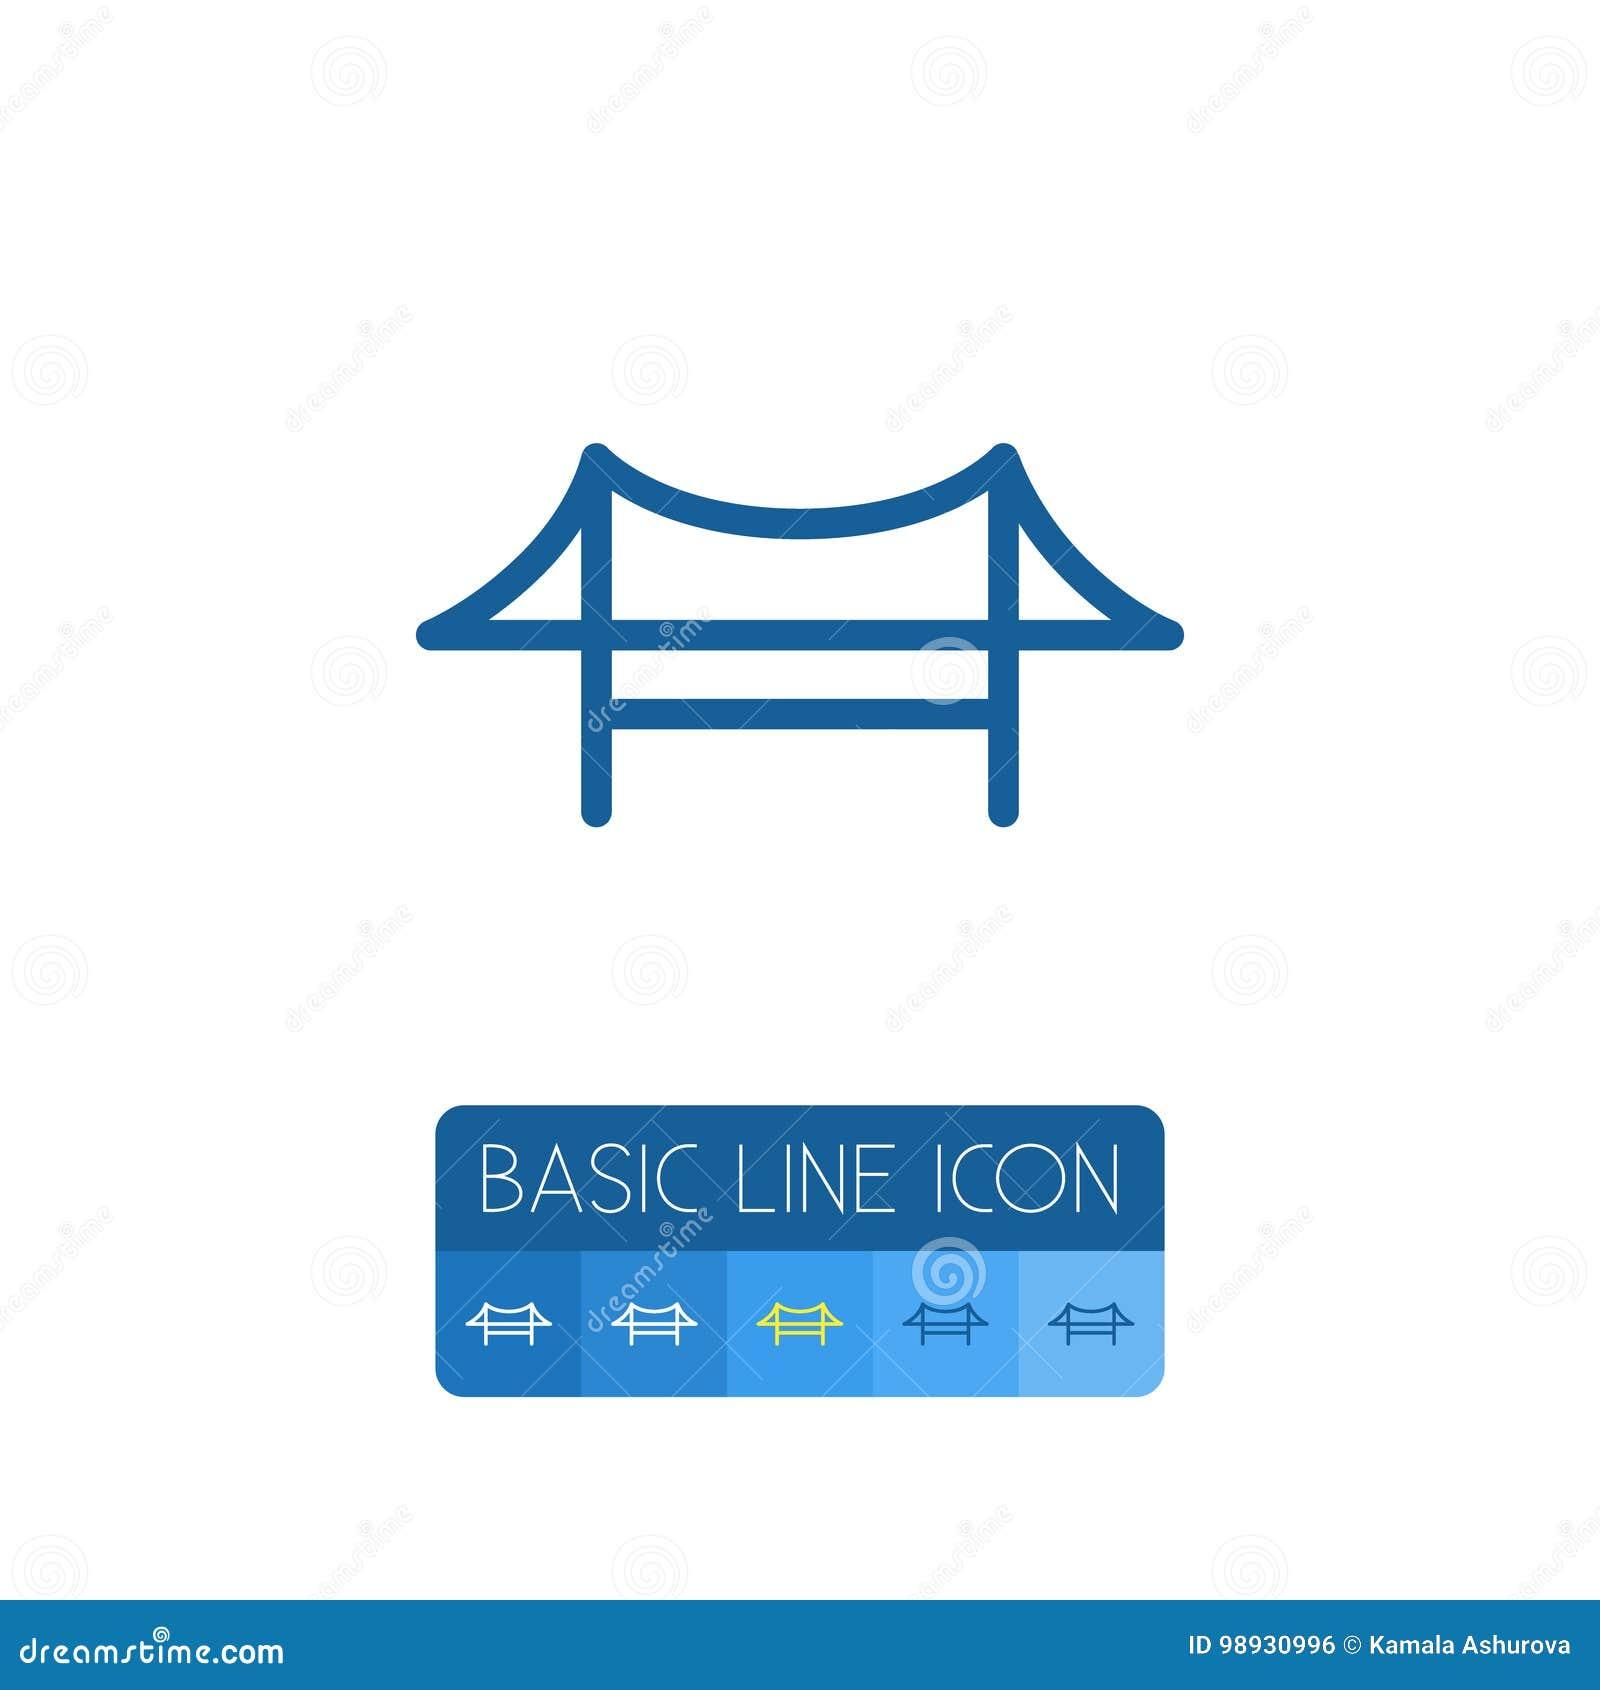 Isolated Bridge Outline. Golden Gate Vector Element Can Be Used For Bridge, Golden, Gate Design Concept.